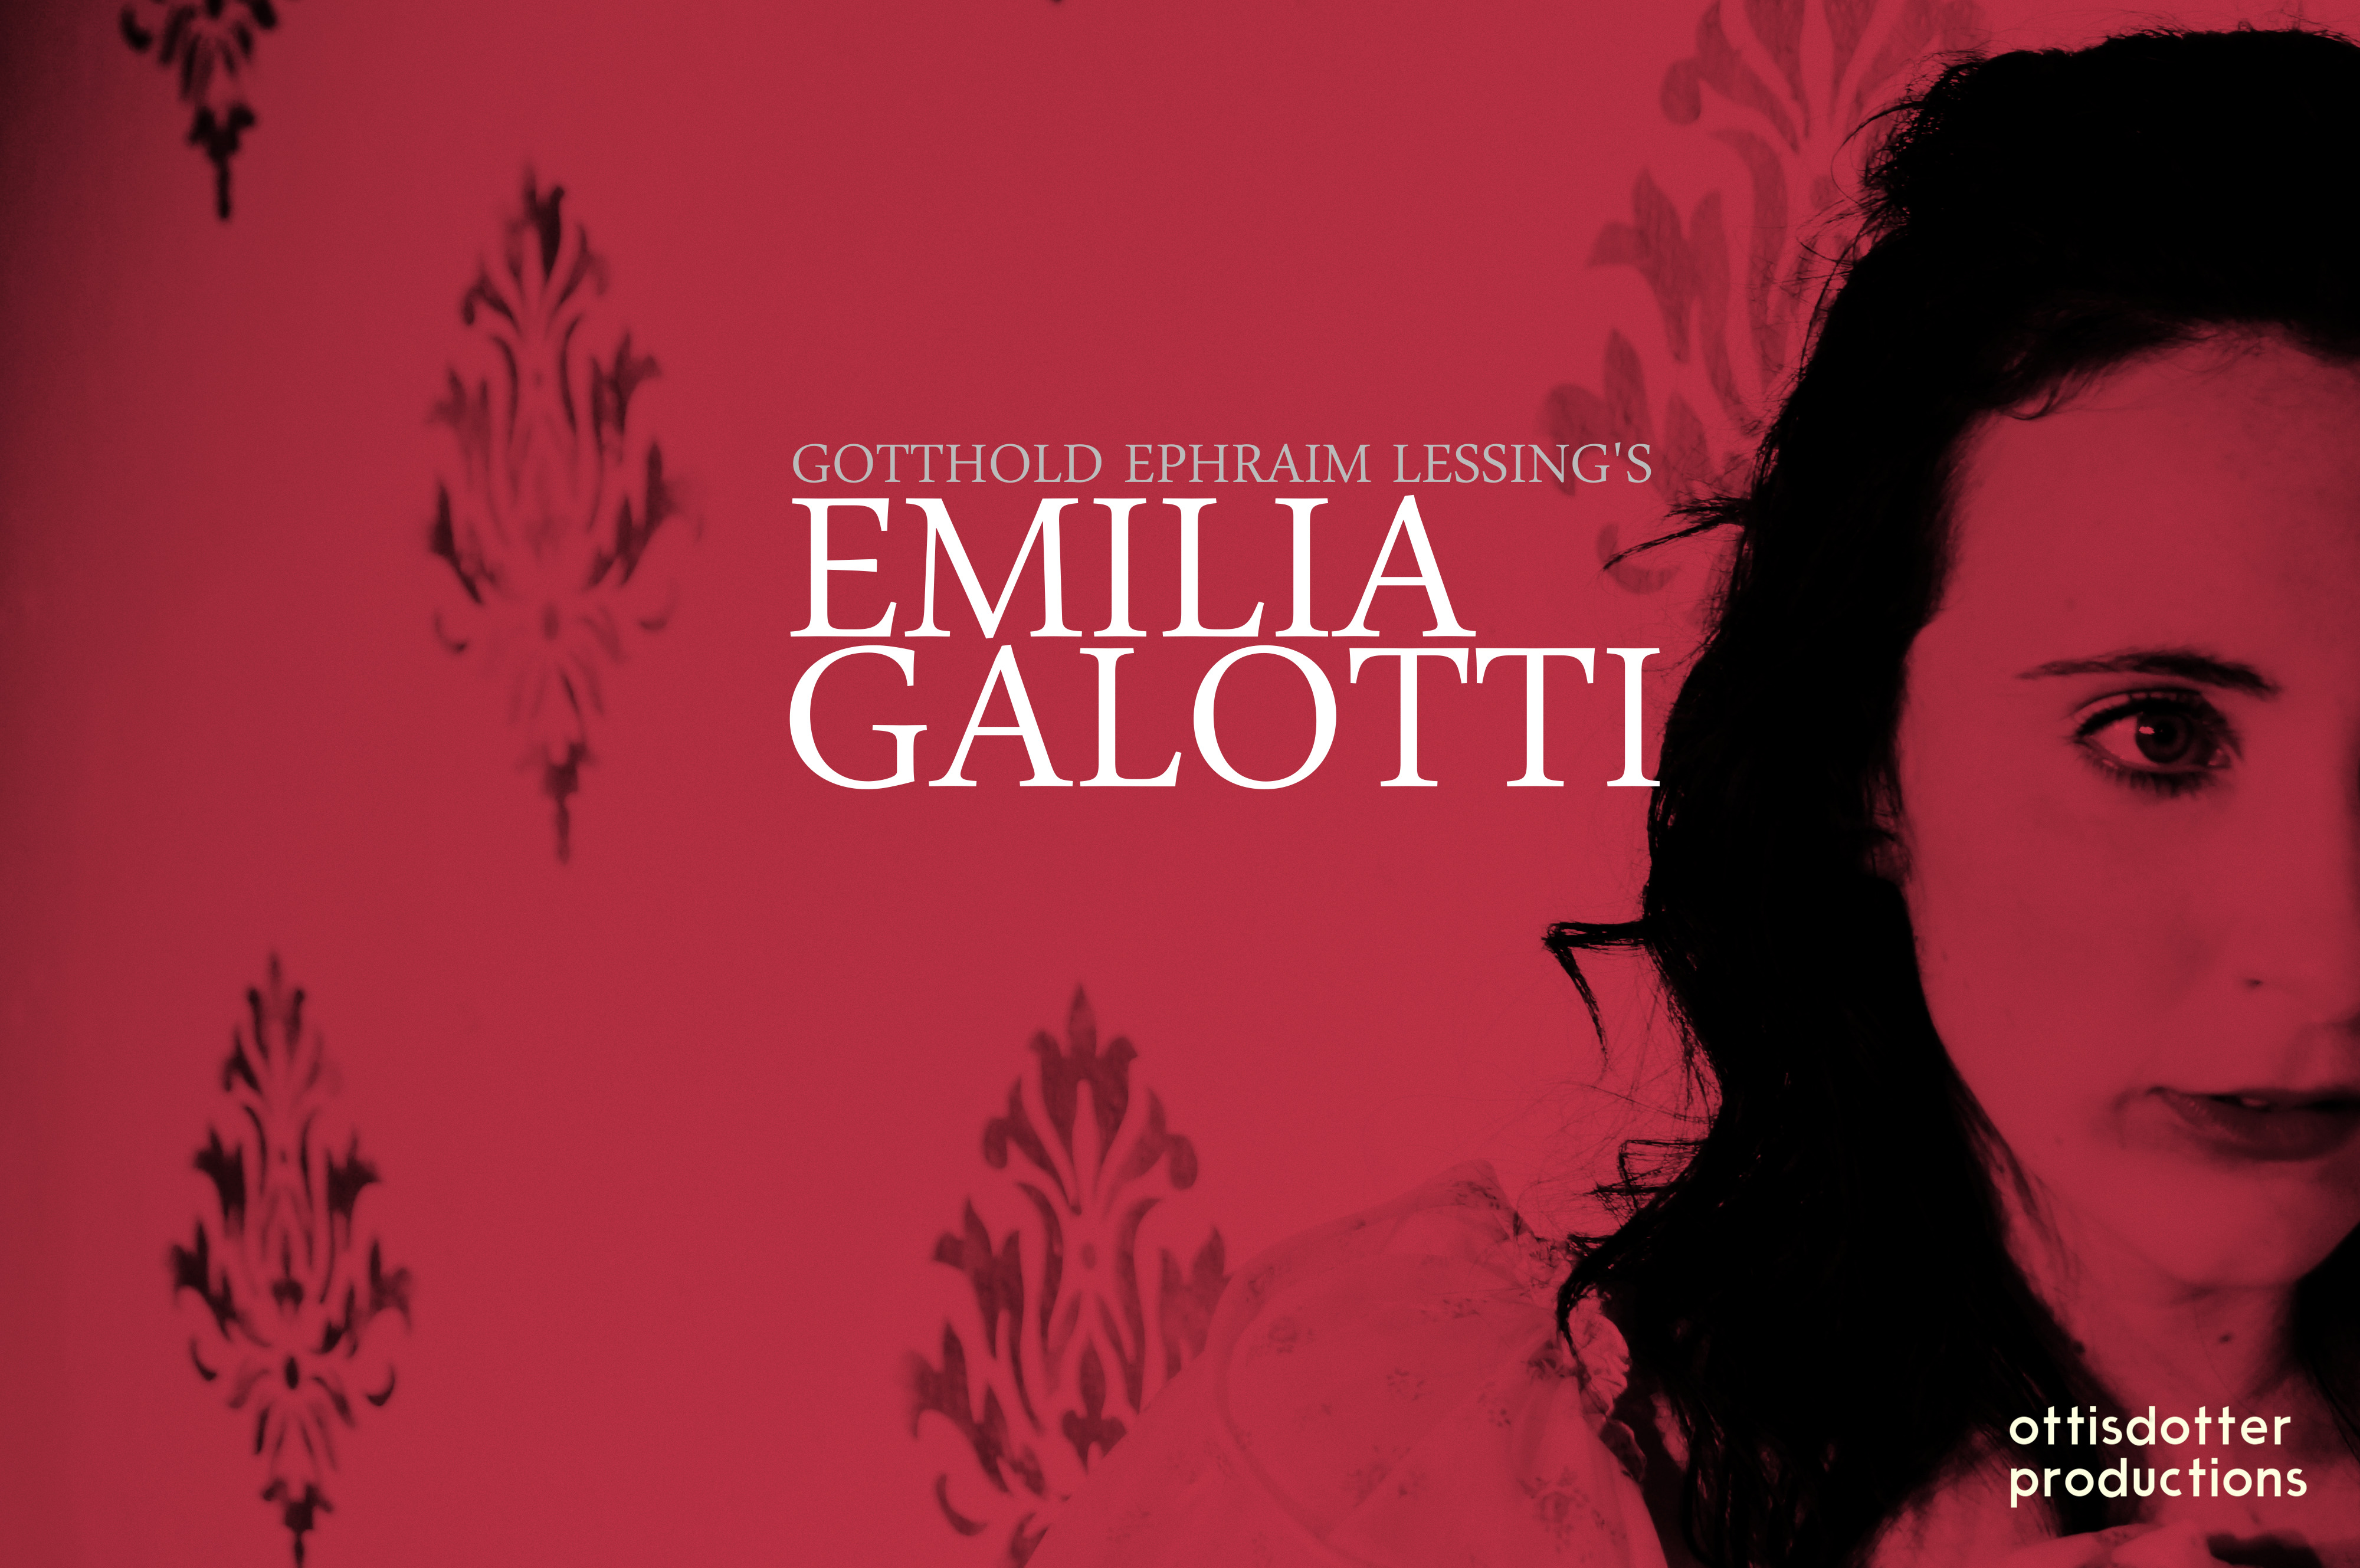 Emilia Galotti (2014)